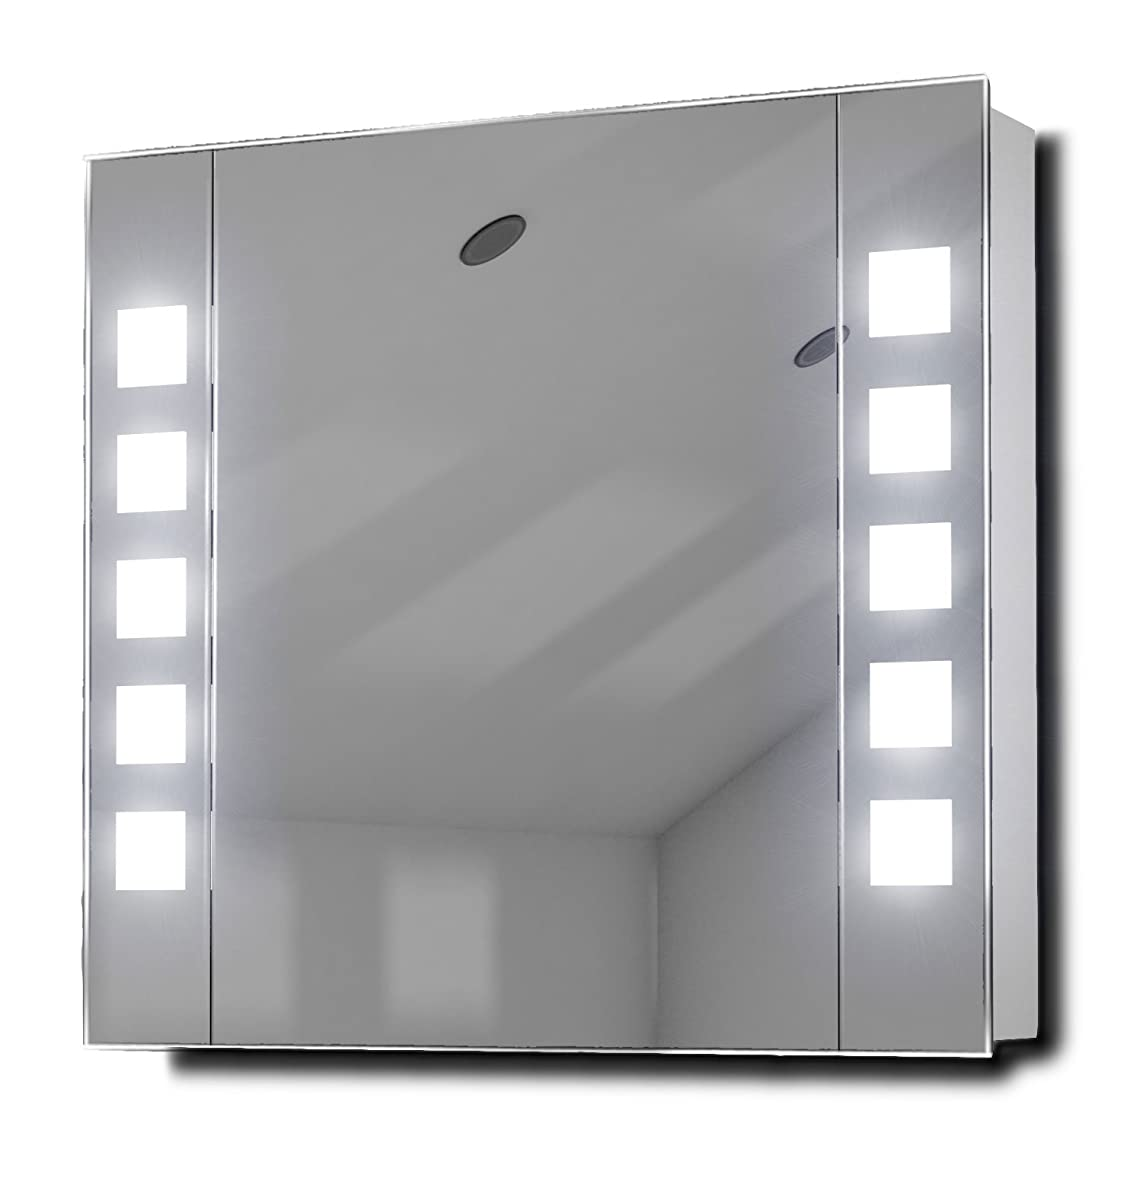 Noble LED Illuminated Bathroom Mirror Cabinet With Sensor & Shaver k16